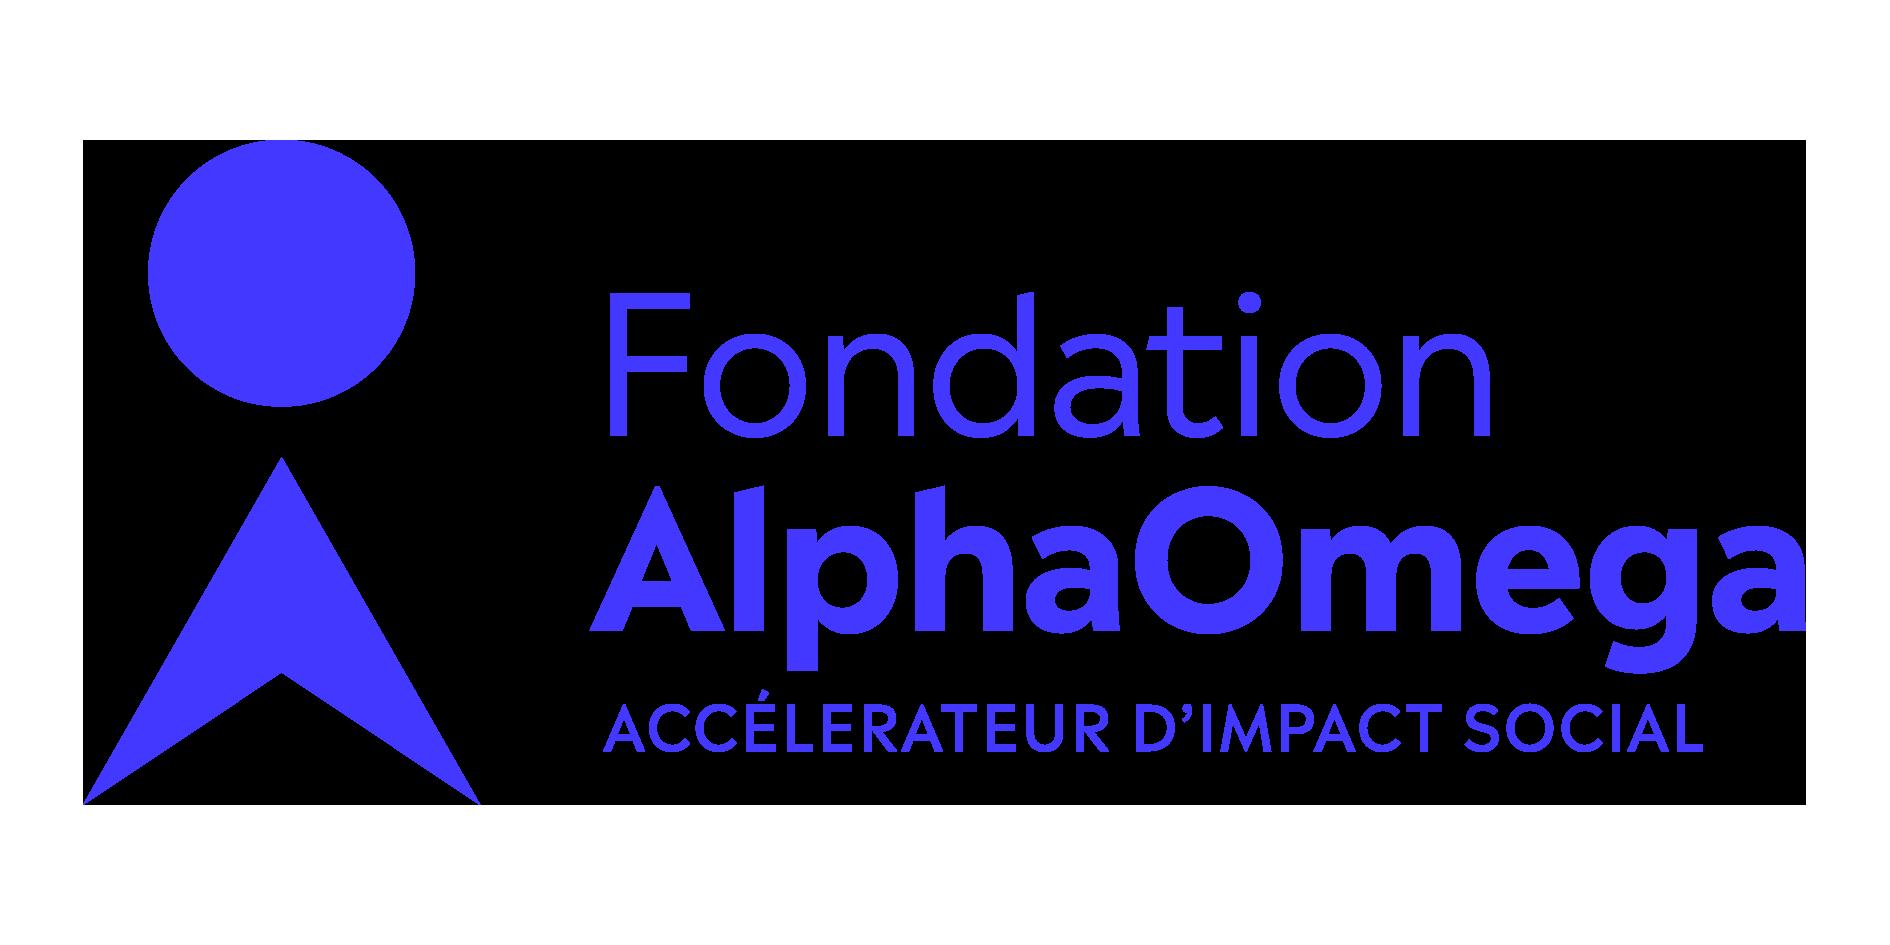 Fondation AlphaOmaga